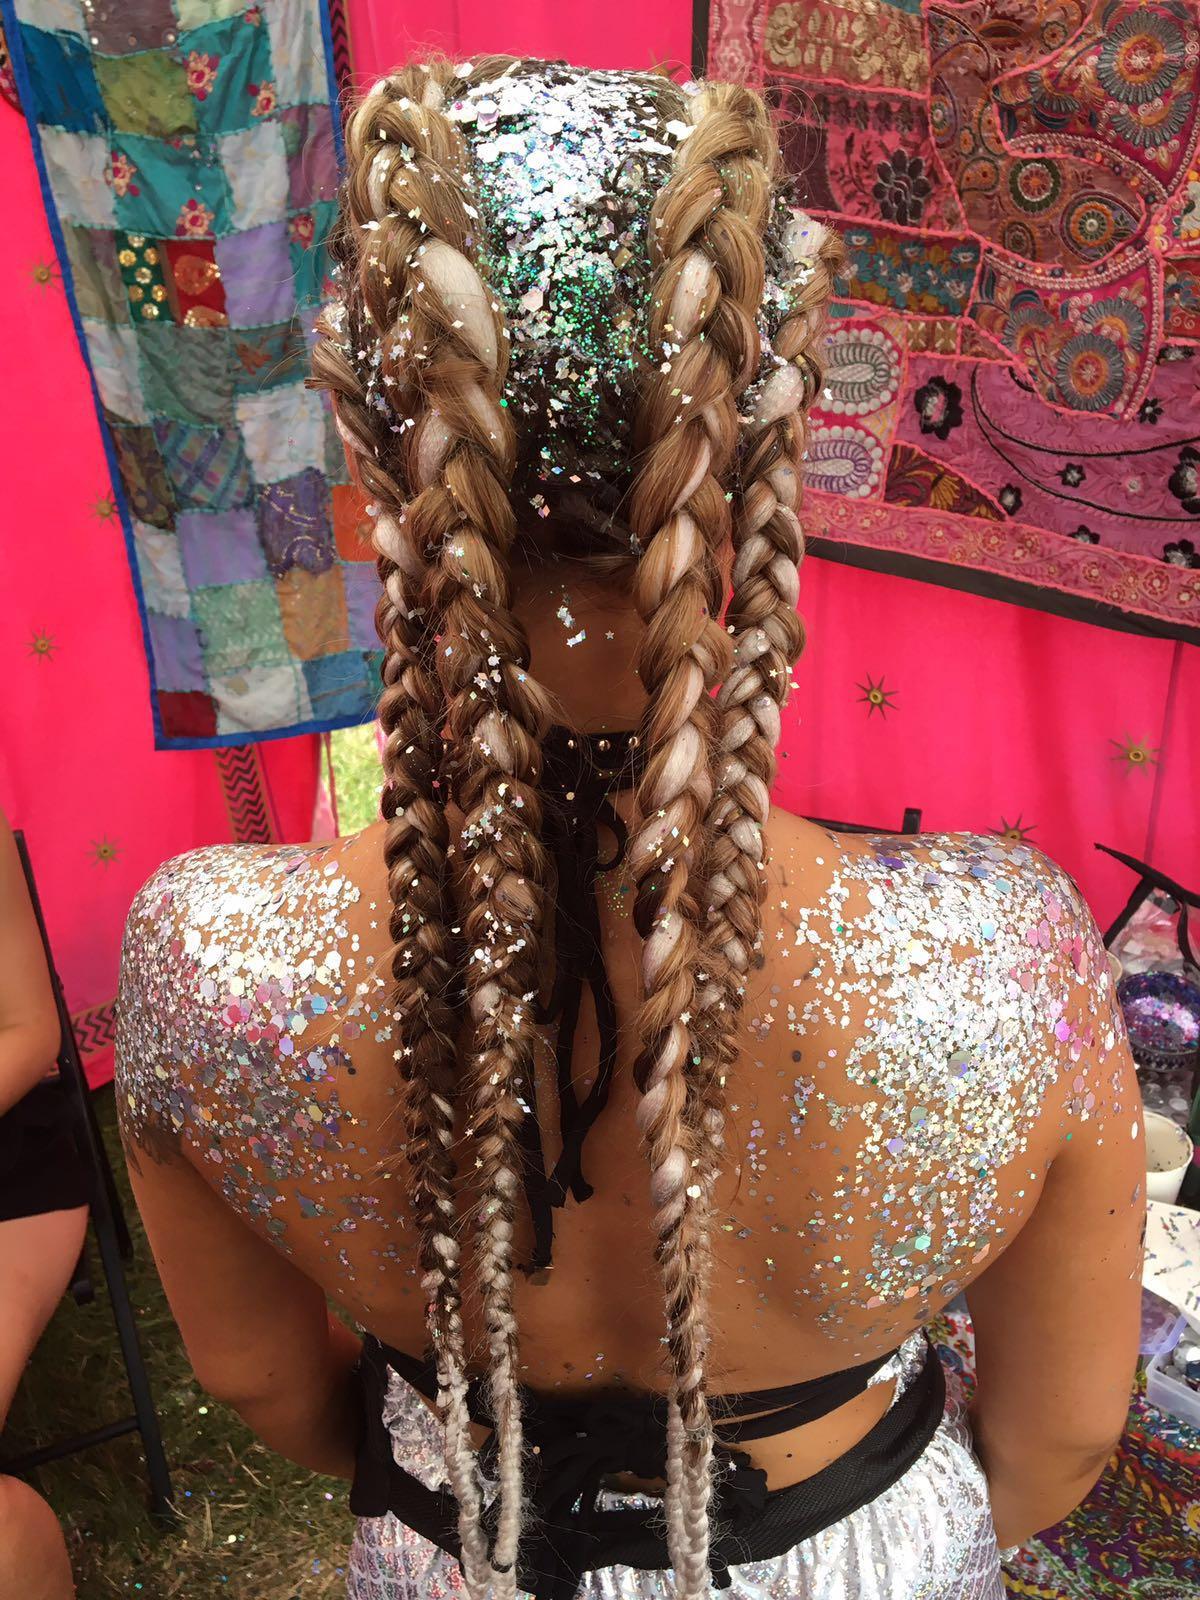 Gypsy-Shrine-makeup-glitter-festival-hair-beauty